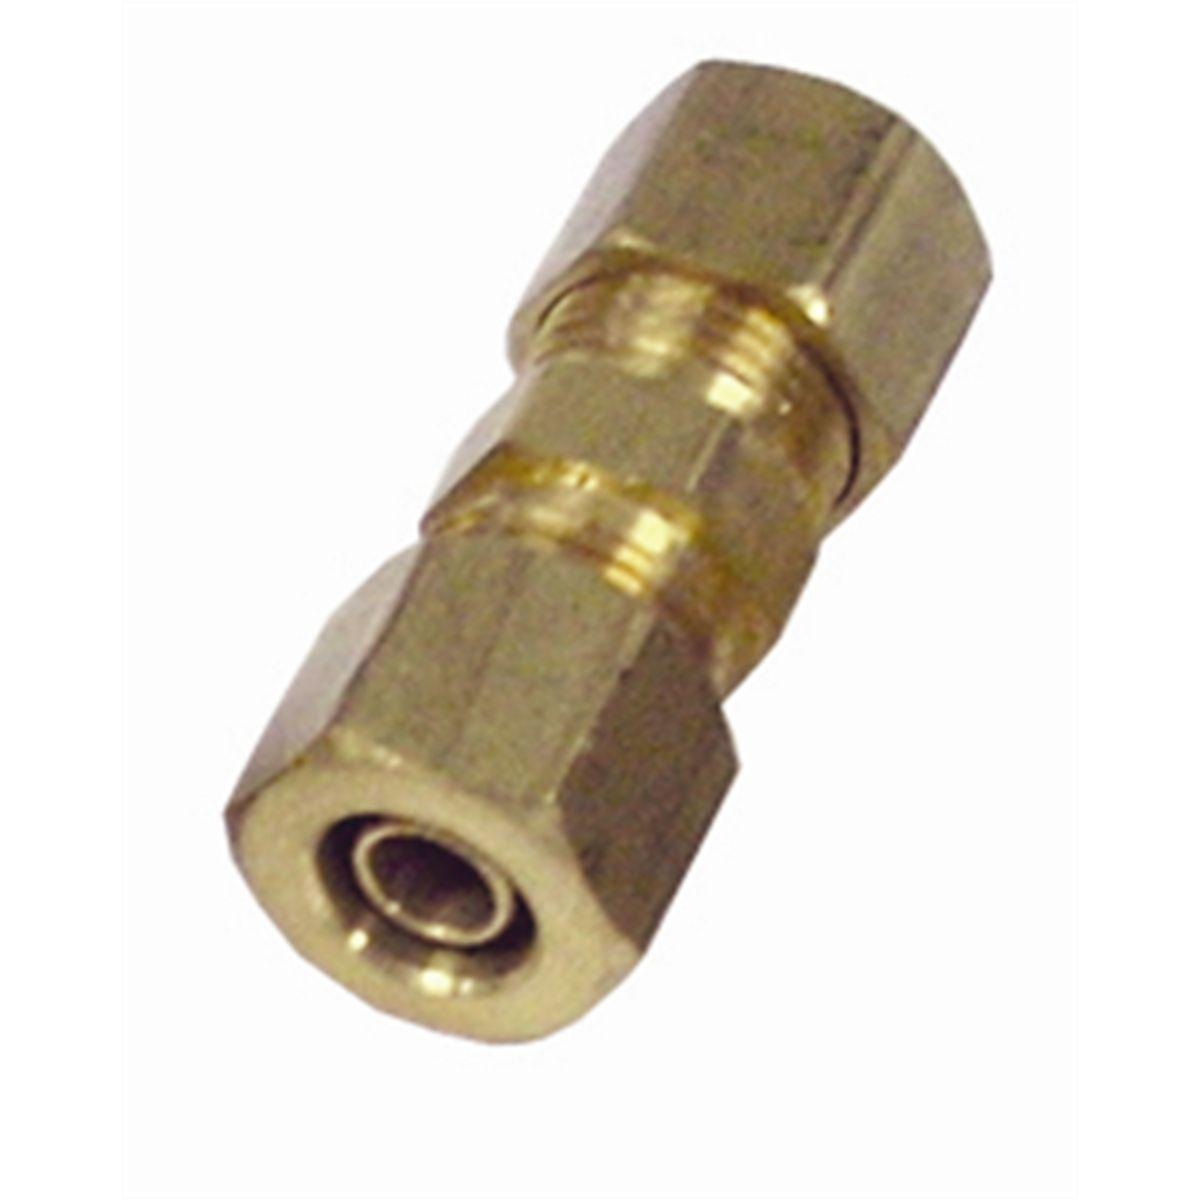 K tool international brass compression union kti